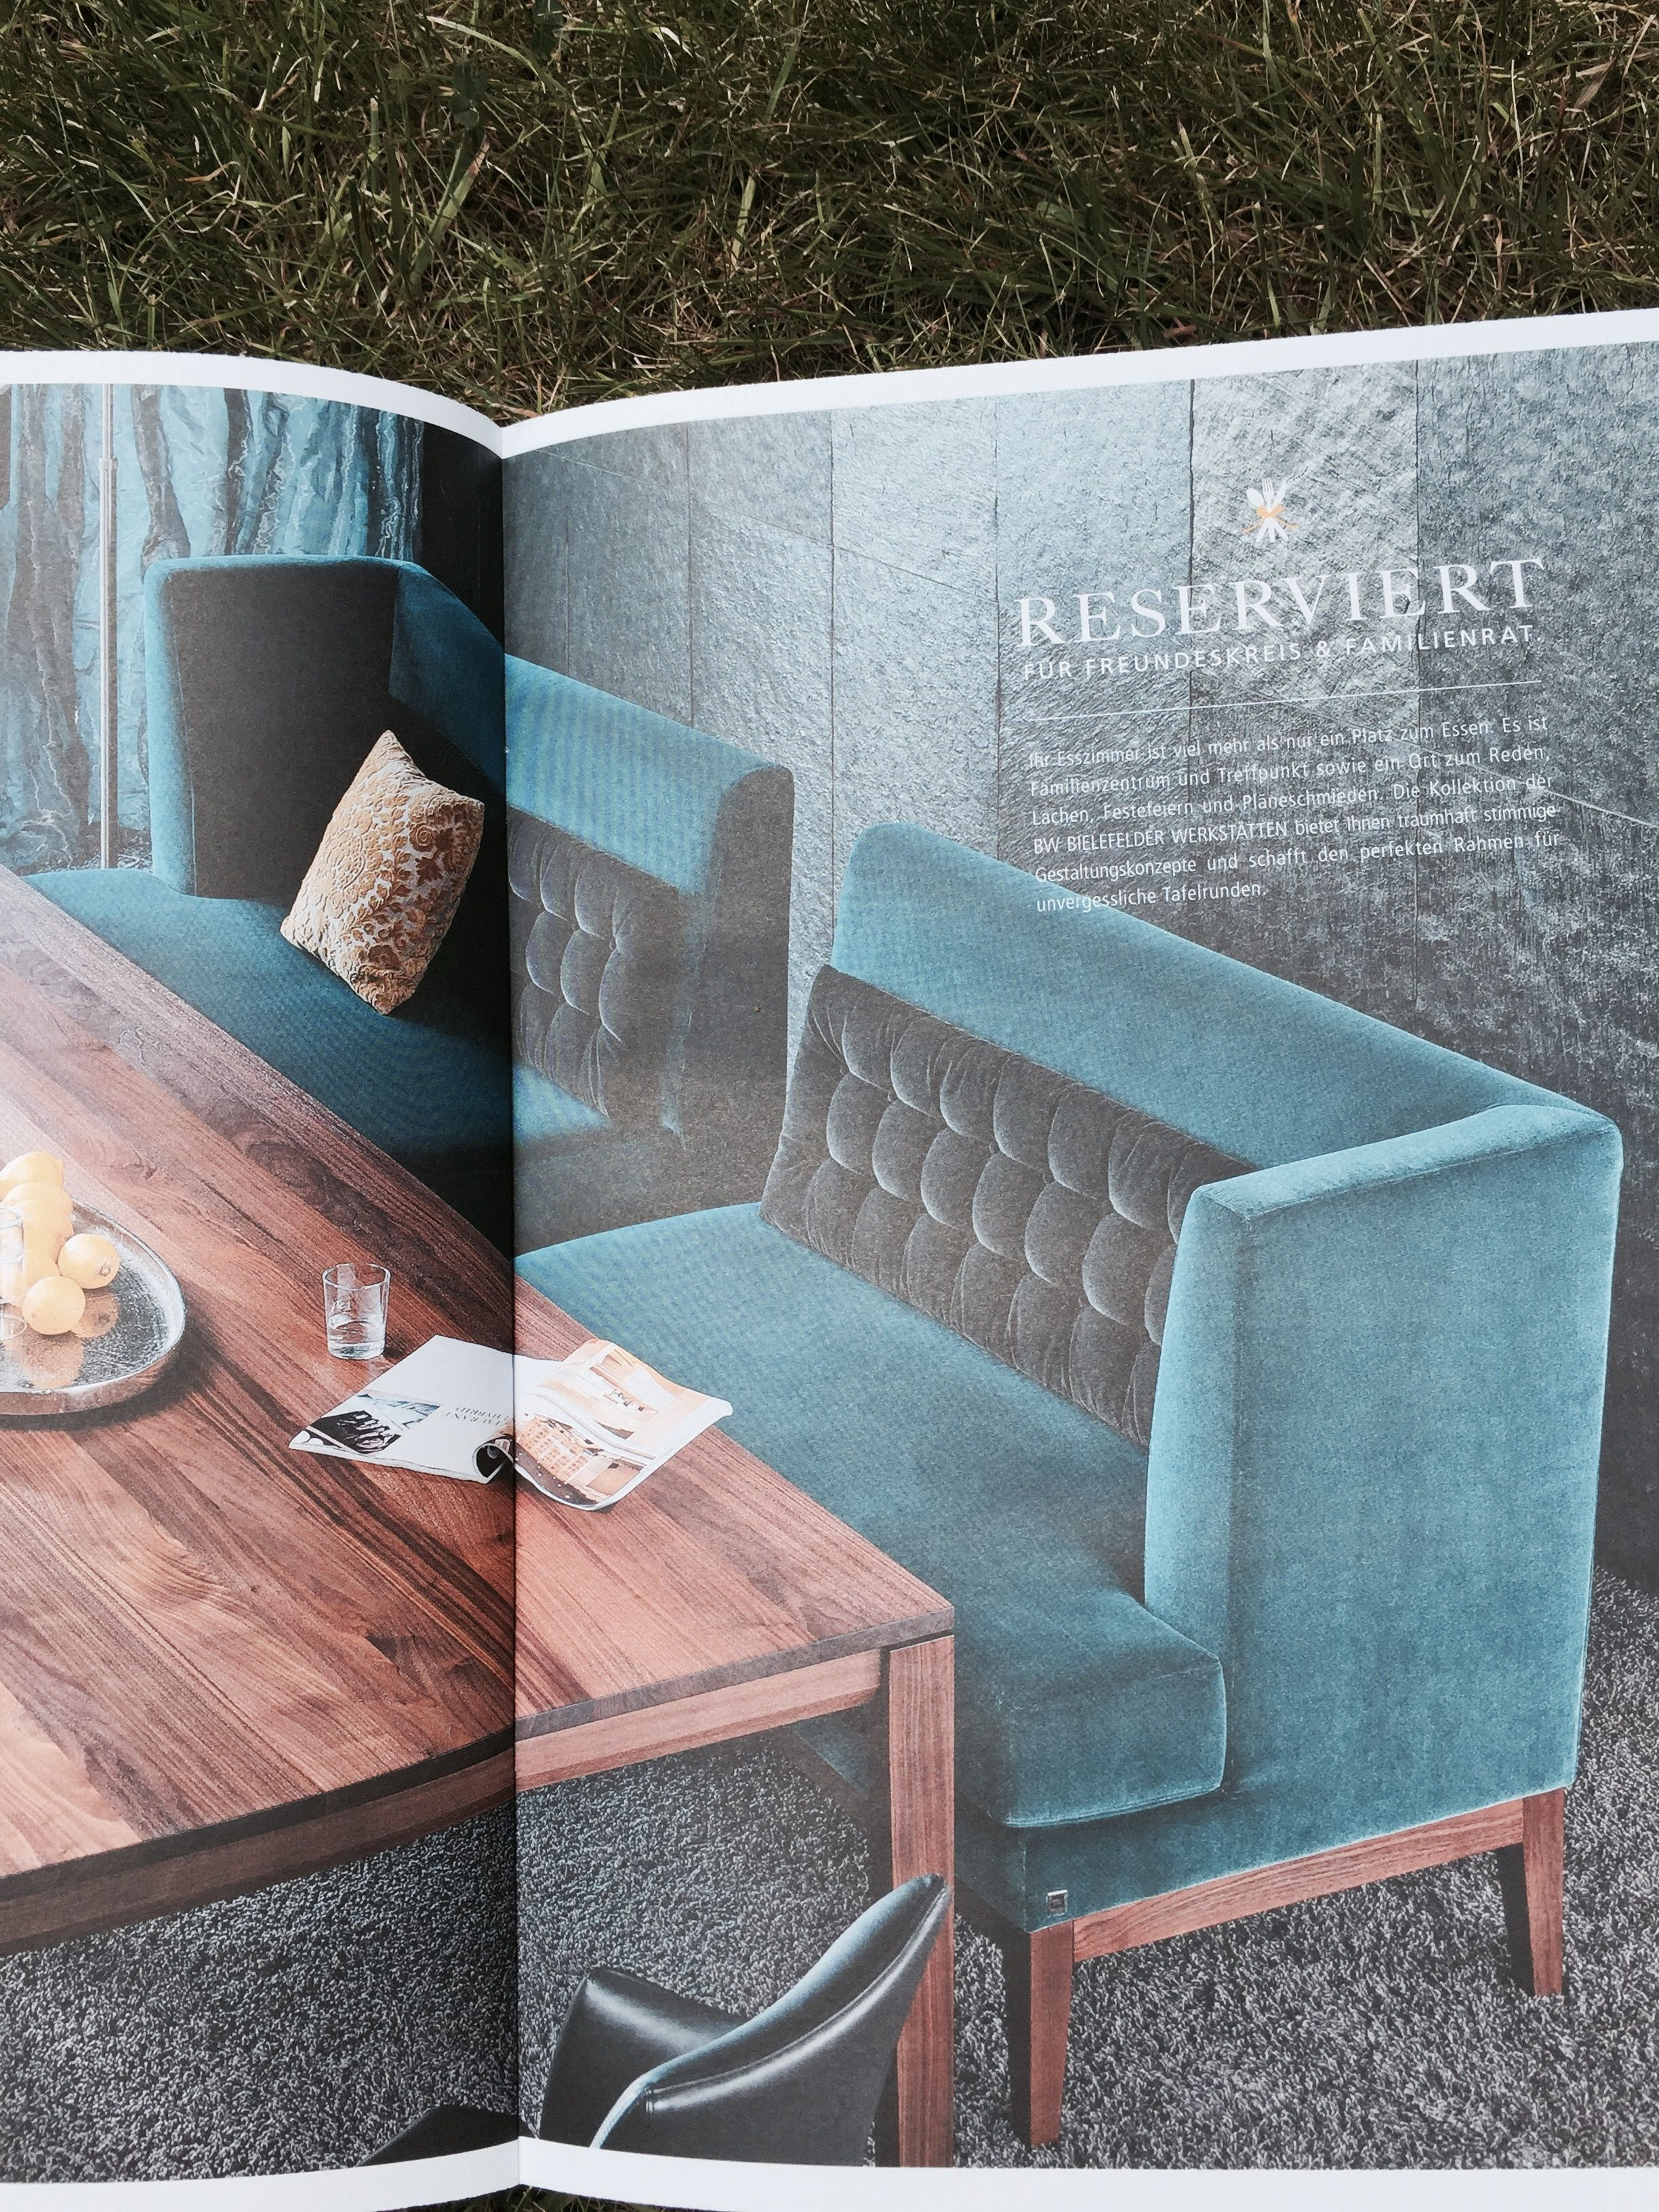 bulthaup kuchen bielefeld, bielefelder werkstätten. sofa polo | casa/ küchen | pinterest, Design ideen